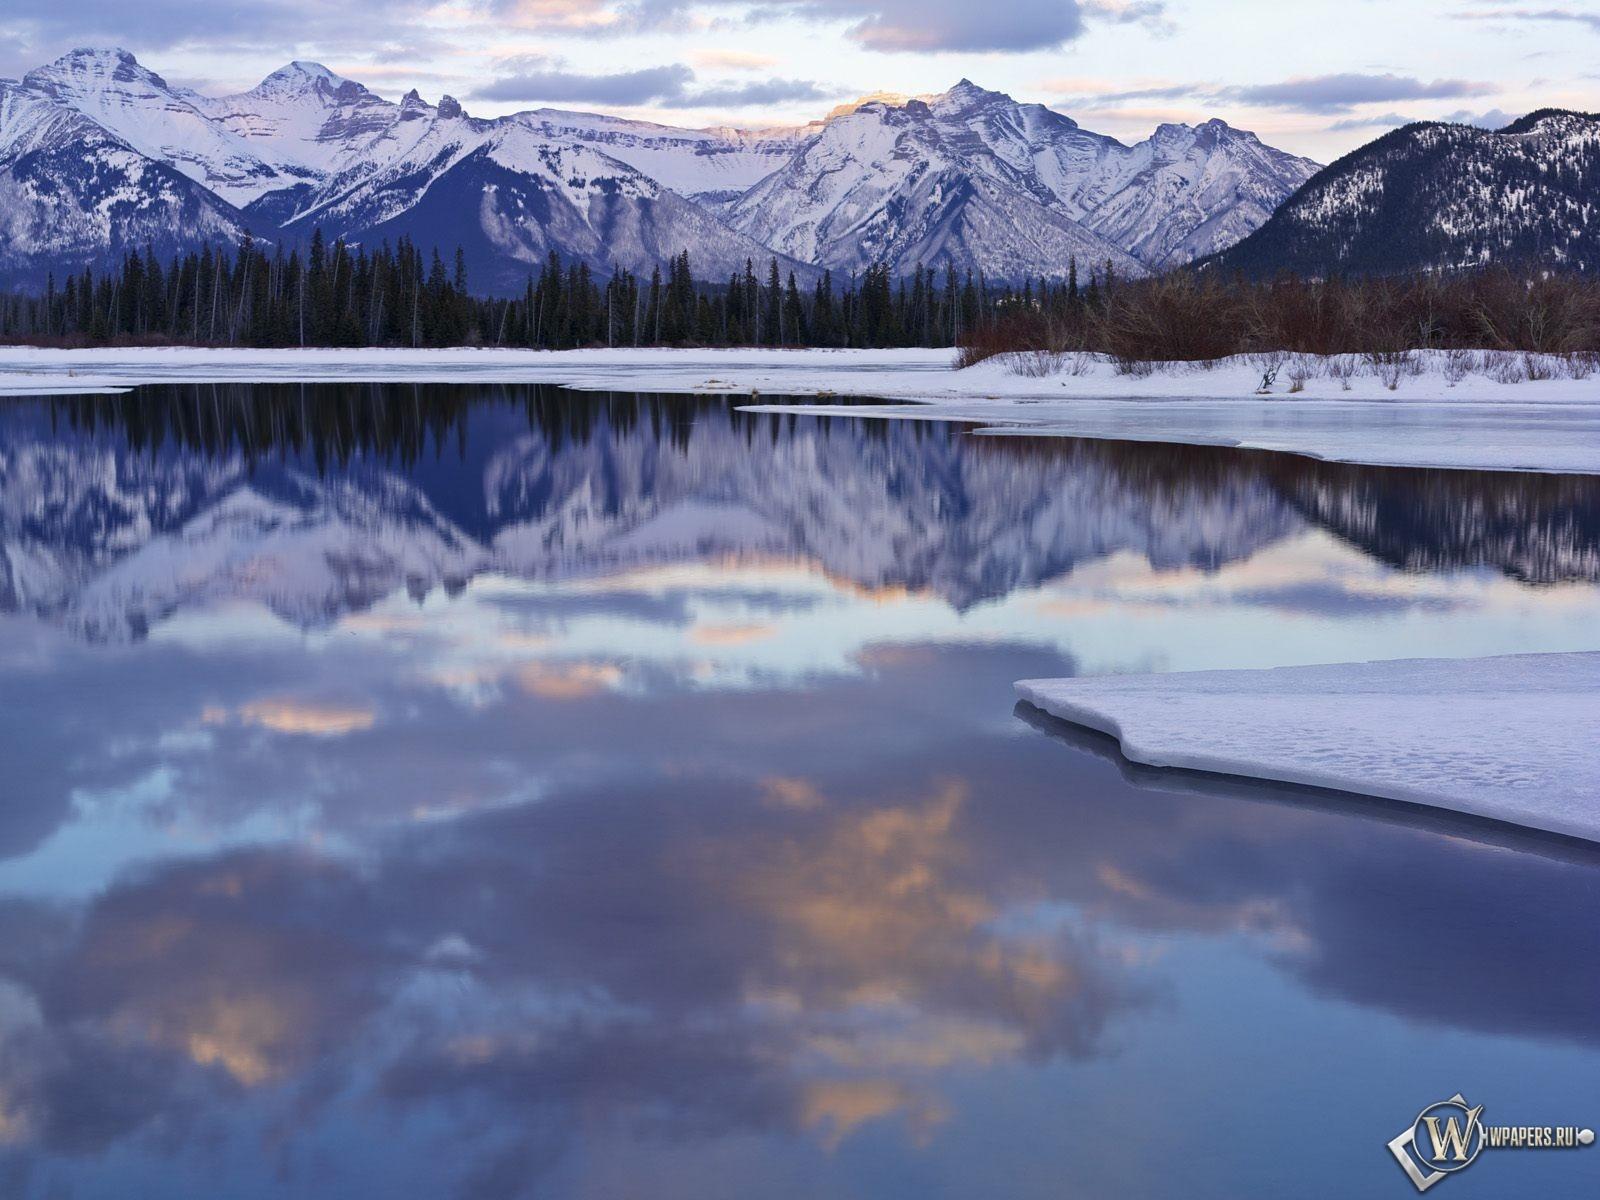 Живописное зимнее озеро 1600x1200